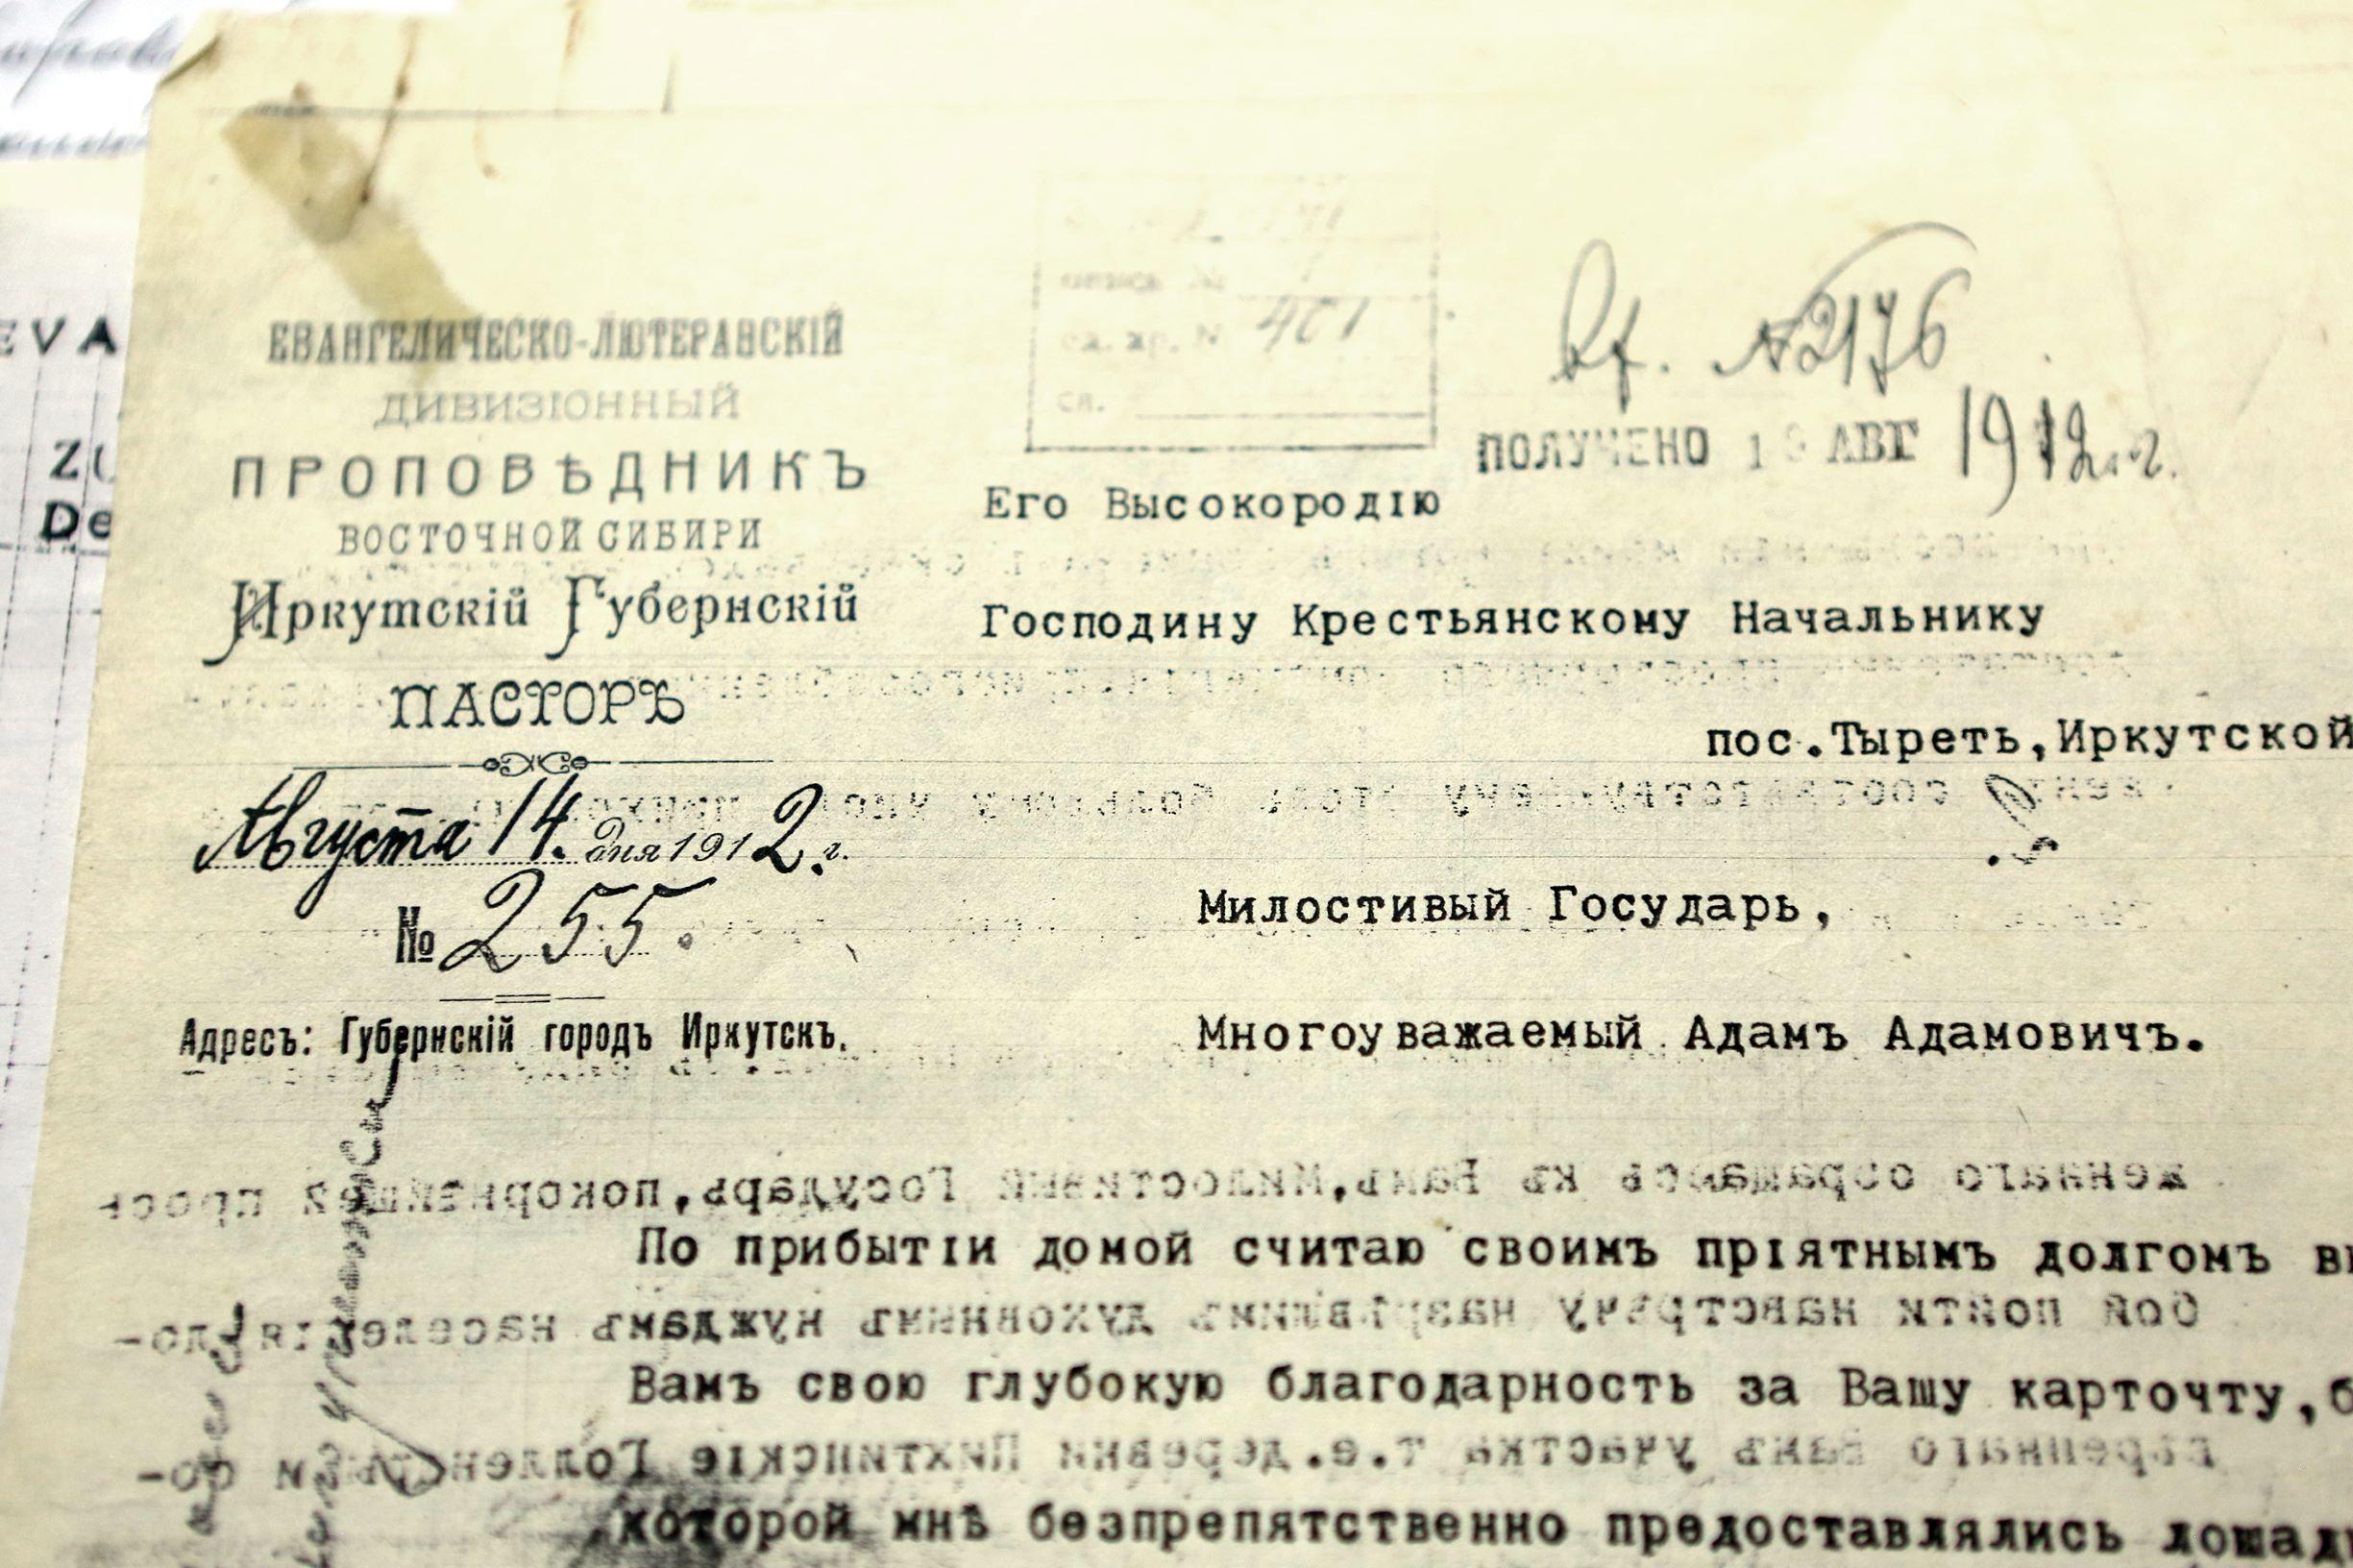 Письмо Вольдемара Сиббуля